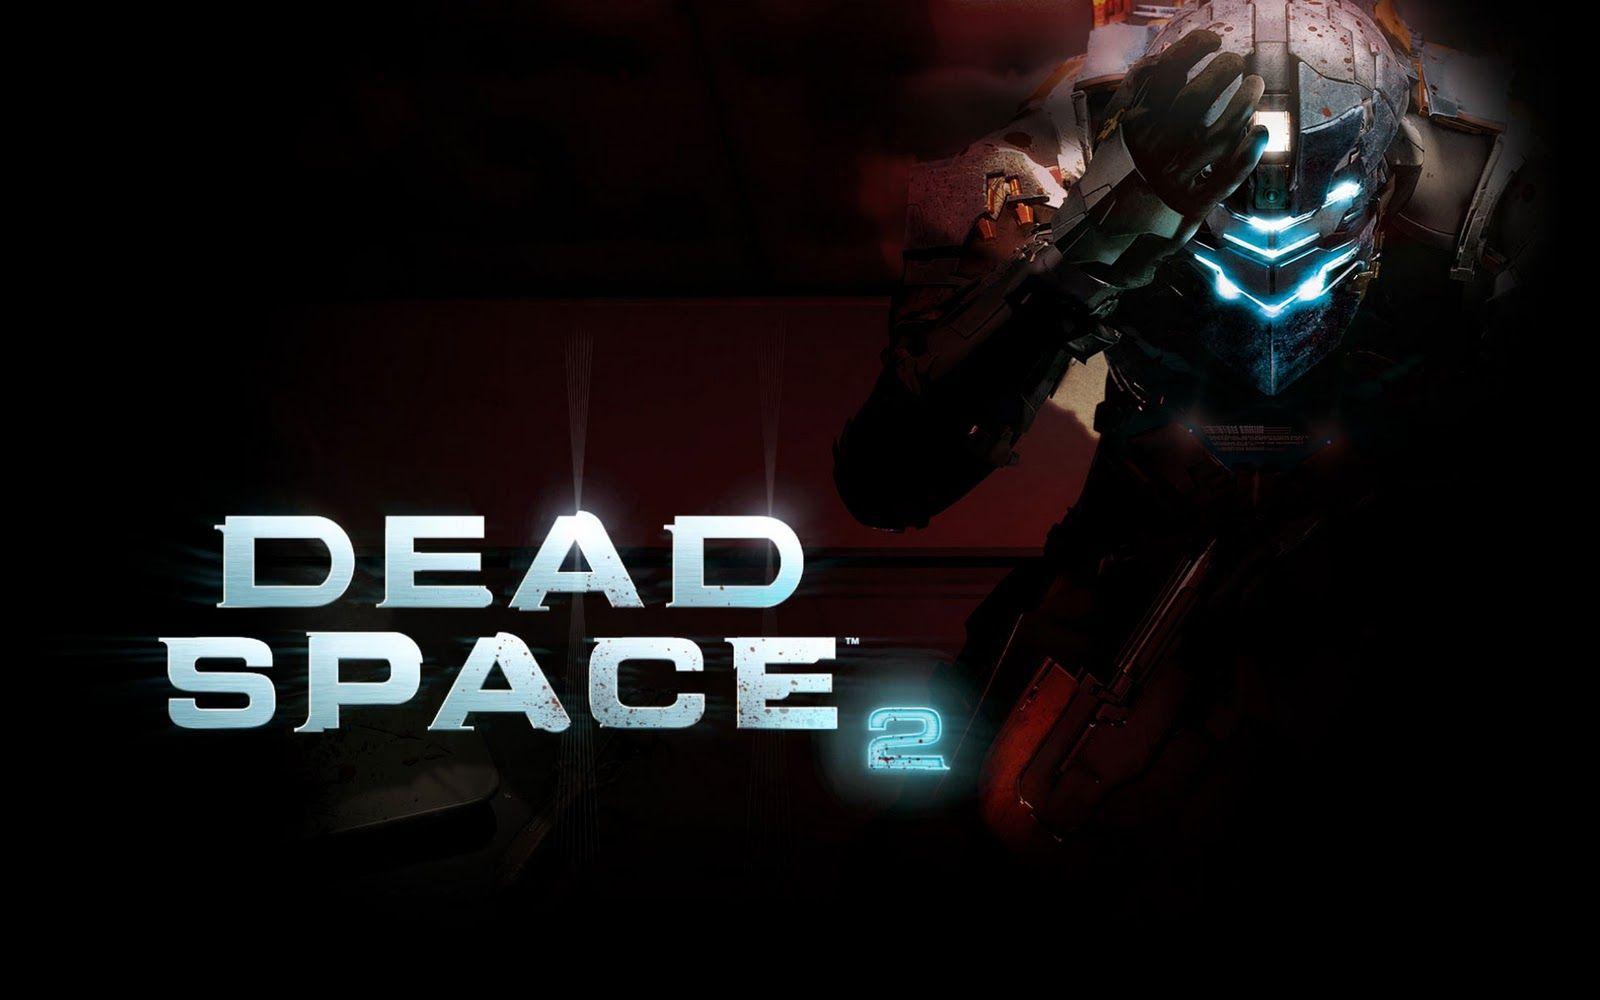 Dead space 2 wallpapers wallpapersafari - Dead space 2 wallpaper 1080p ...